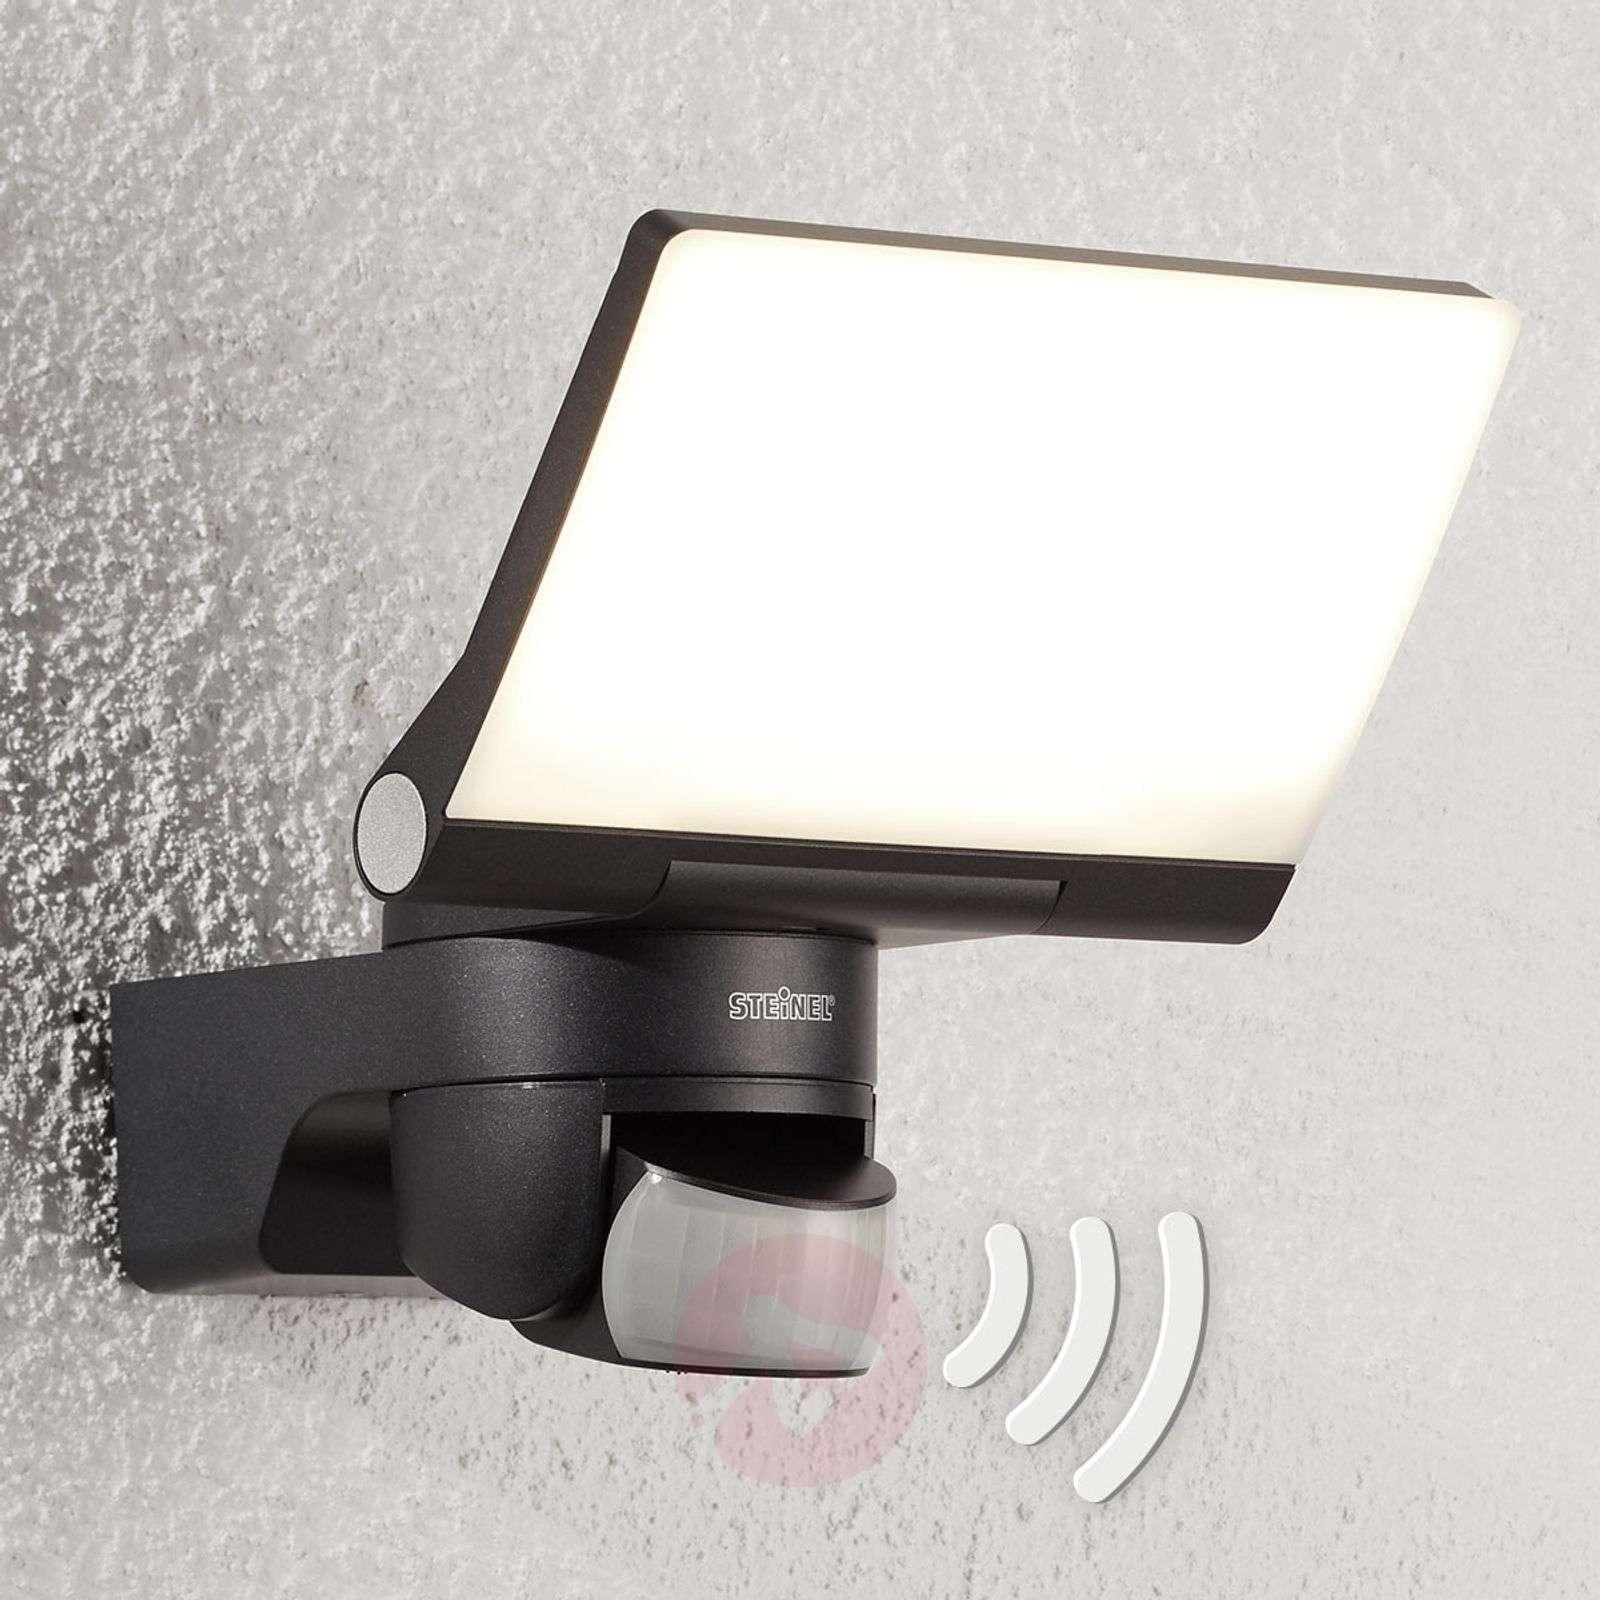 LED wall light XLED HOME 2 with motion sensor | Lights.ie